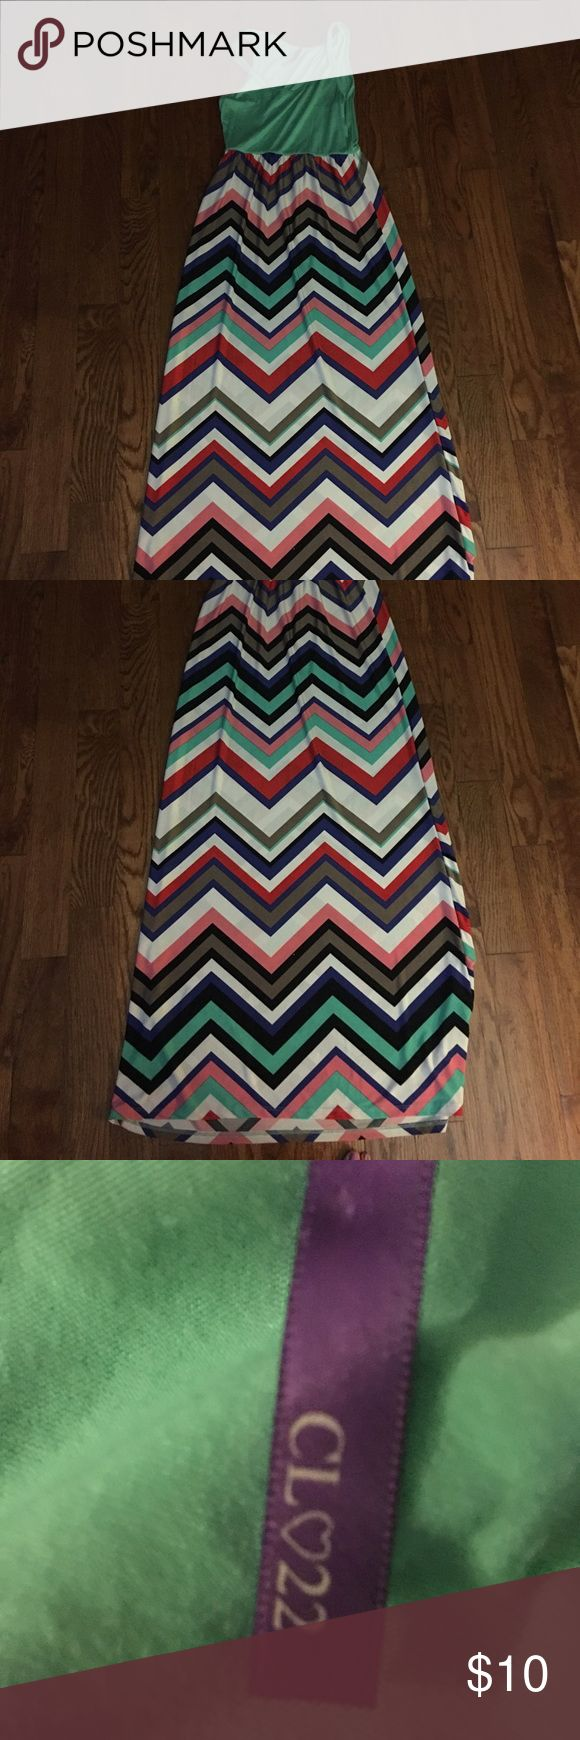 Cute chevron print maxi dress Chevron print maxi dress Dresses Maxi